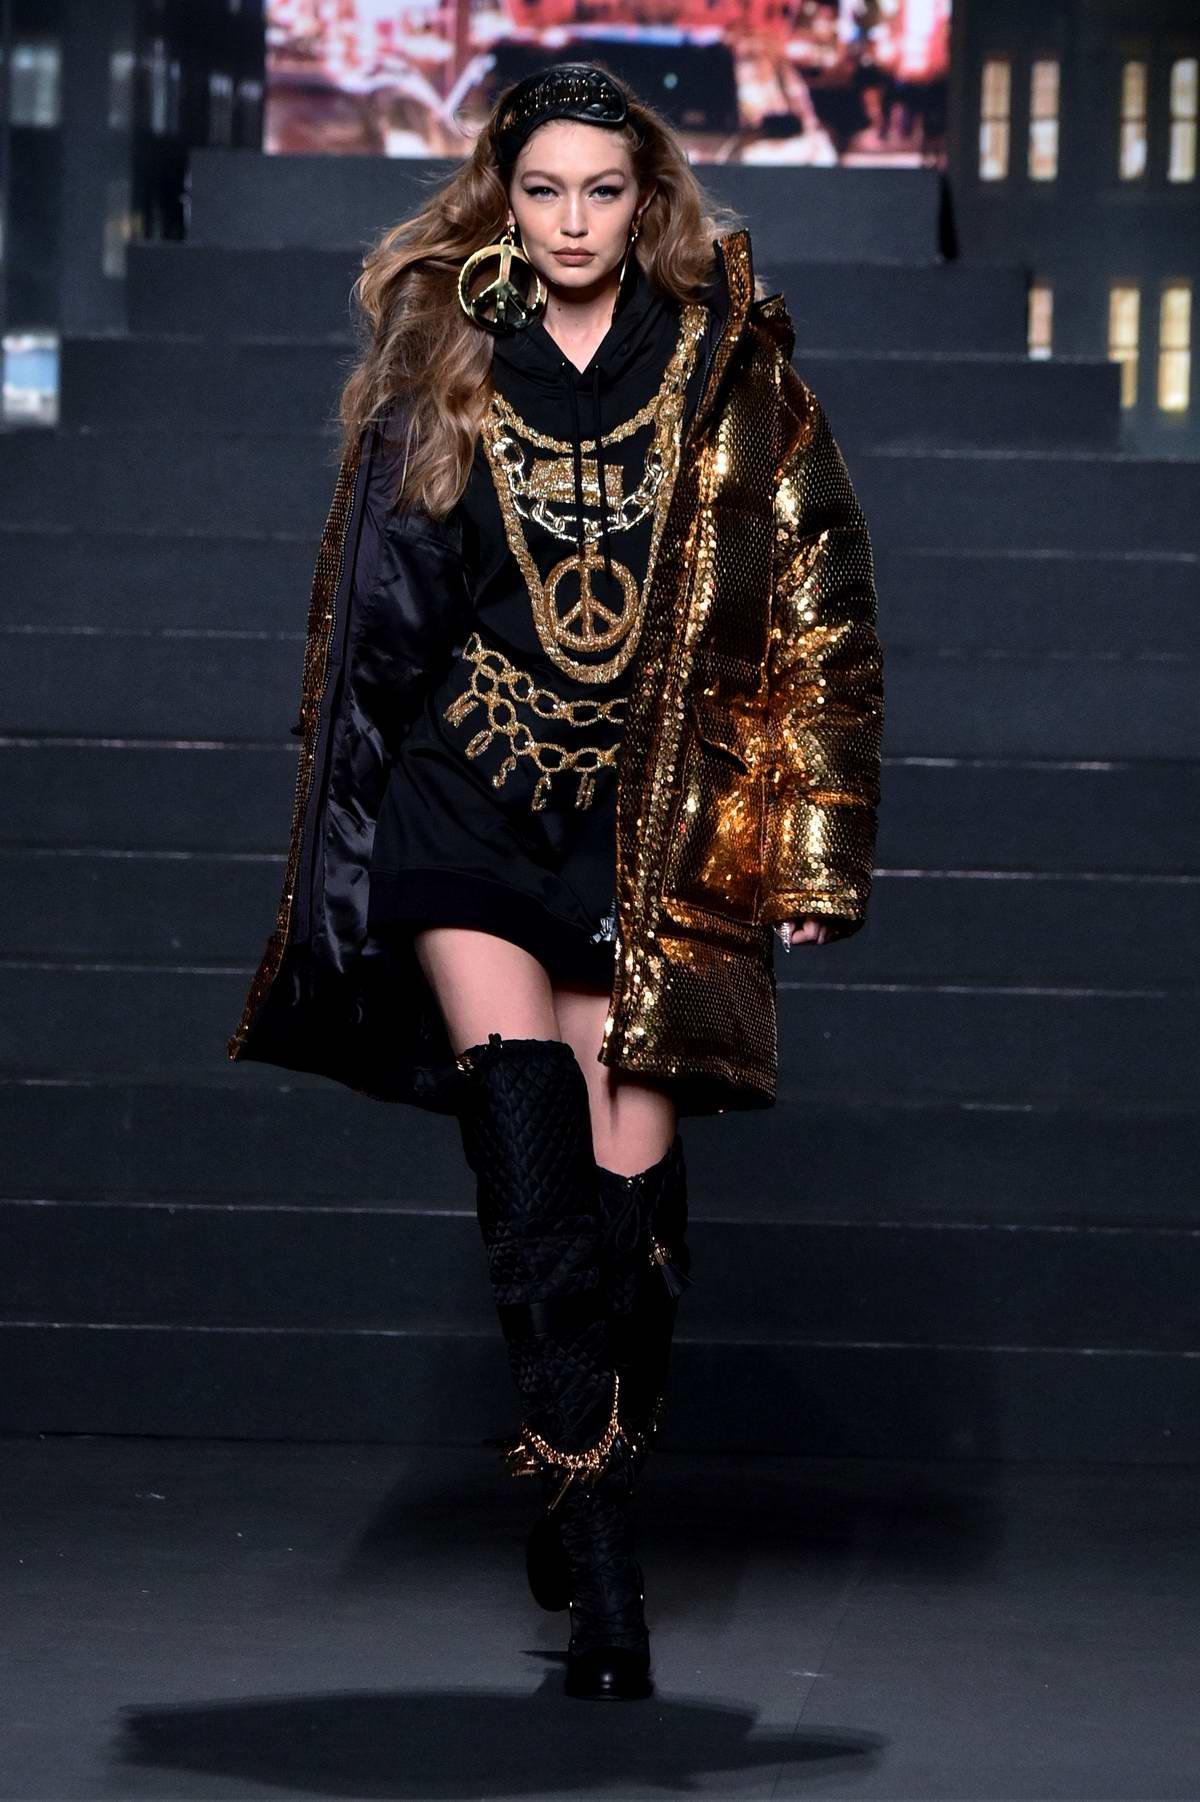 Gigi Hadid walks the runway during Moschino x H&M Fashion Show in New York City